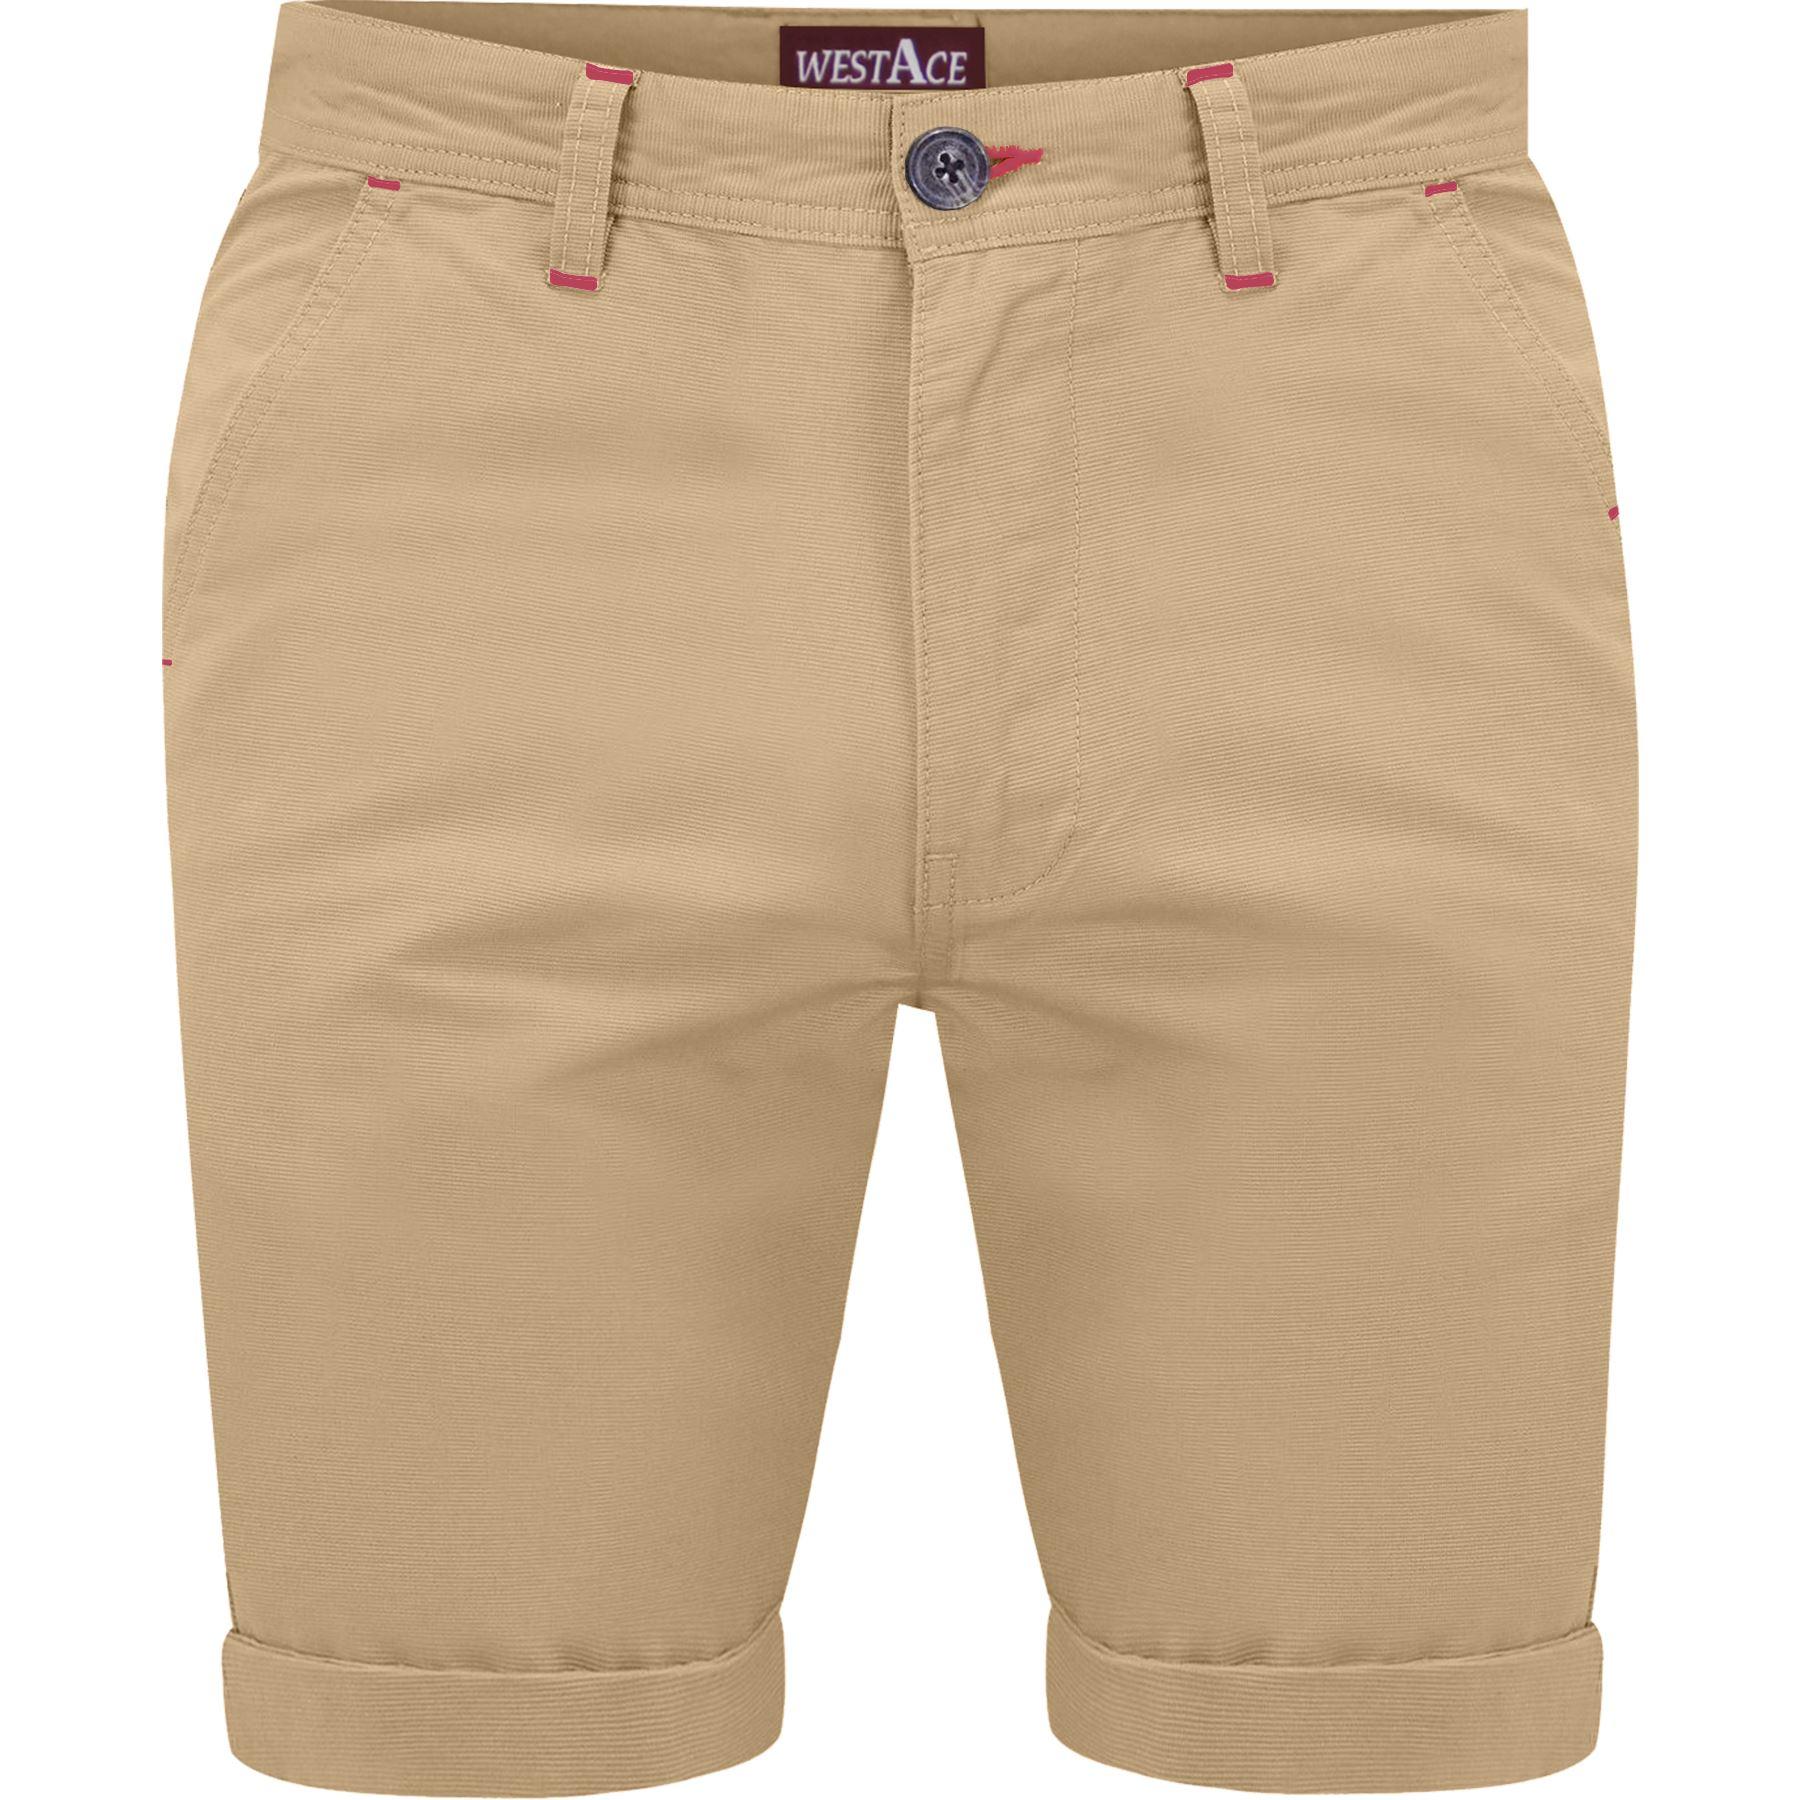 Mens-Chino-Shorts-Cotton-Summer-Casual-Jeans-Cargo-Combat-Half-Pants-Casual-New thumbnail 15